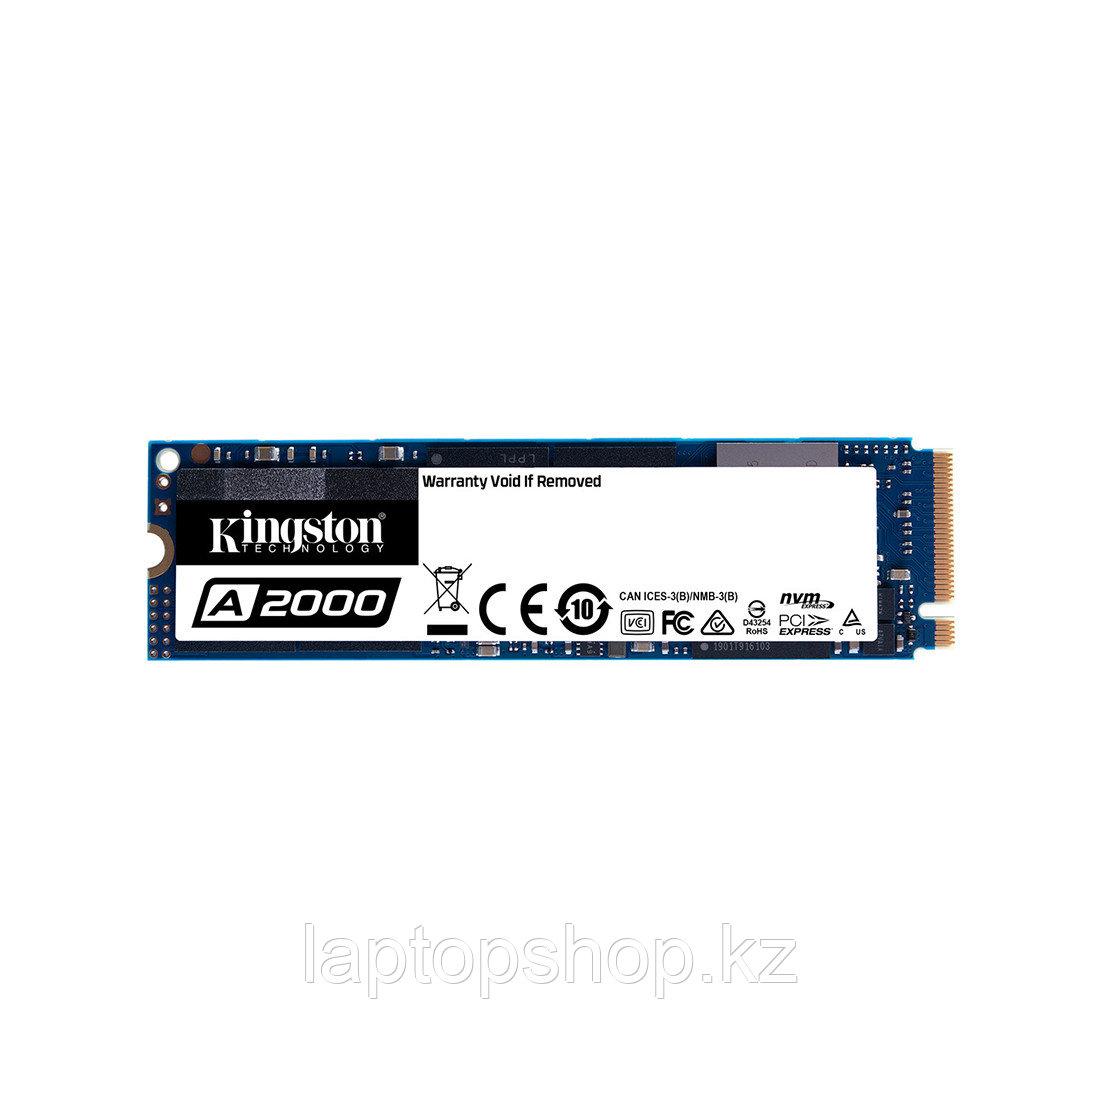 Kingston SSD 500 GB, SA2000M8/500G, M.2 NVMe PCIe 3.0x4